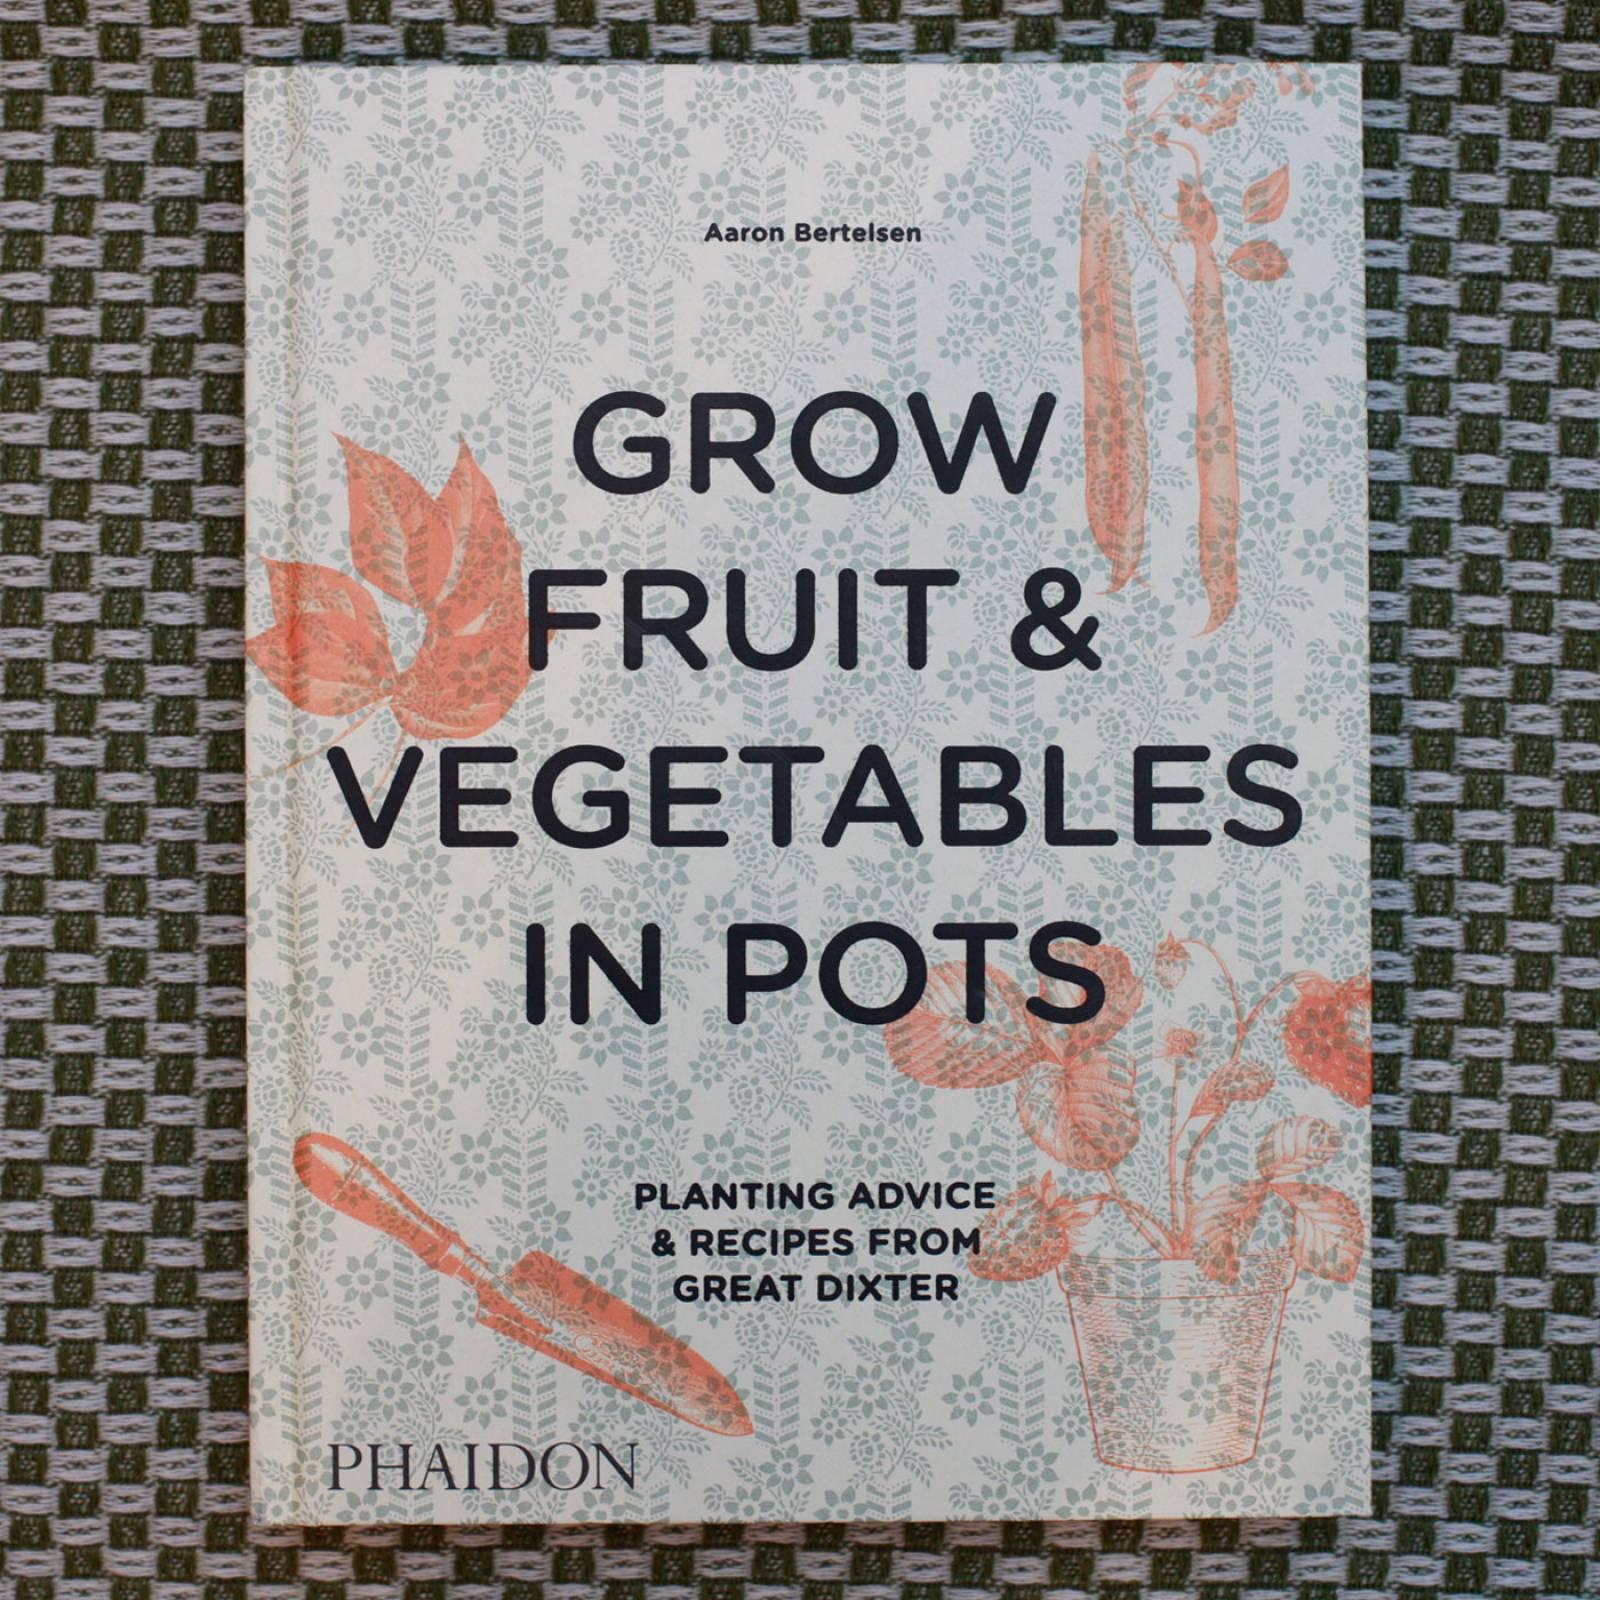 Grow Fruit & Vegetables in Pots - Hardback Book thumbnails